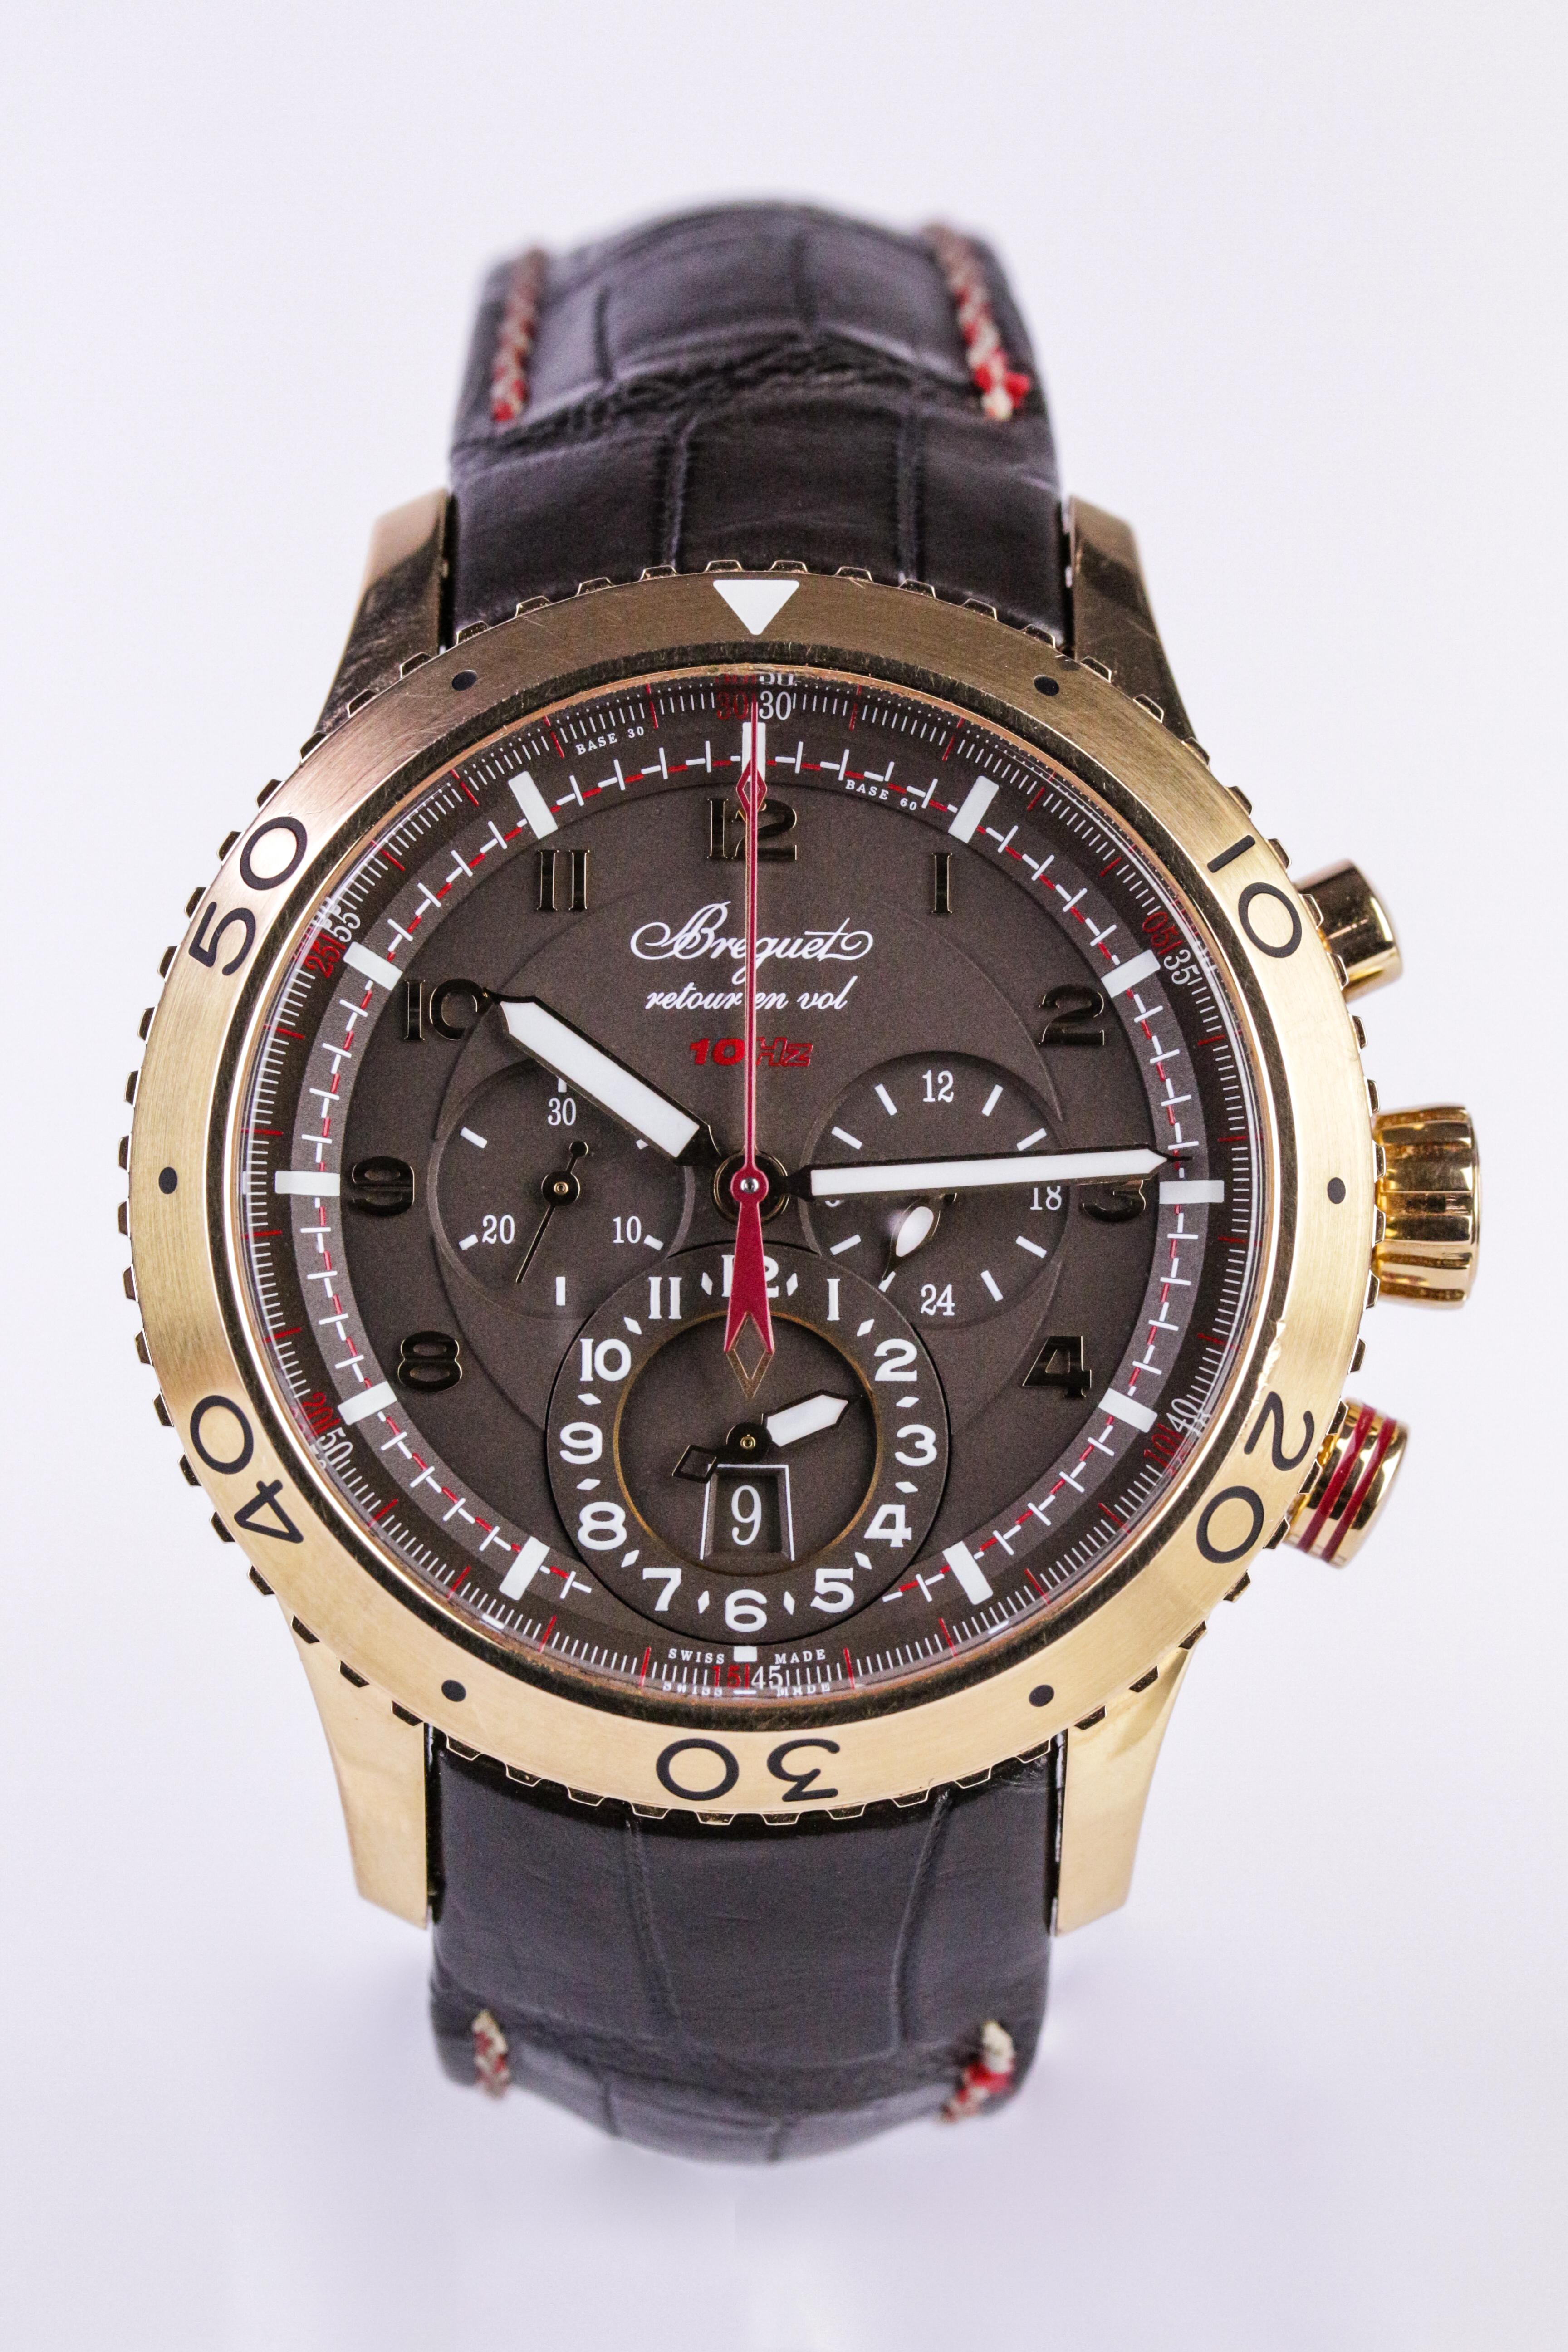 Breguet Type XXII Flyback Chronograph Watch. Photo: John Pye Auctions